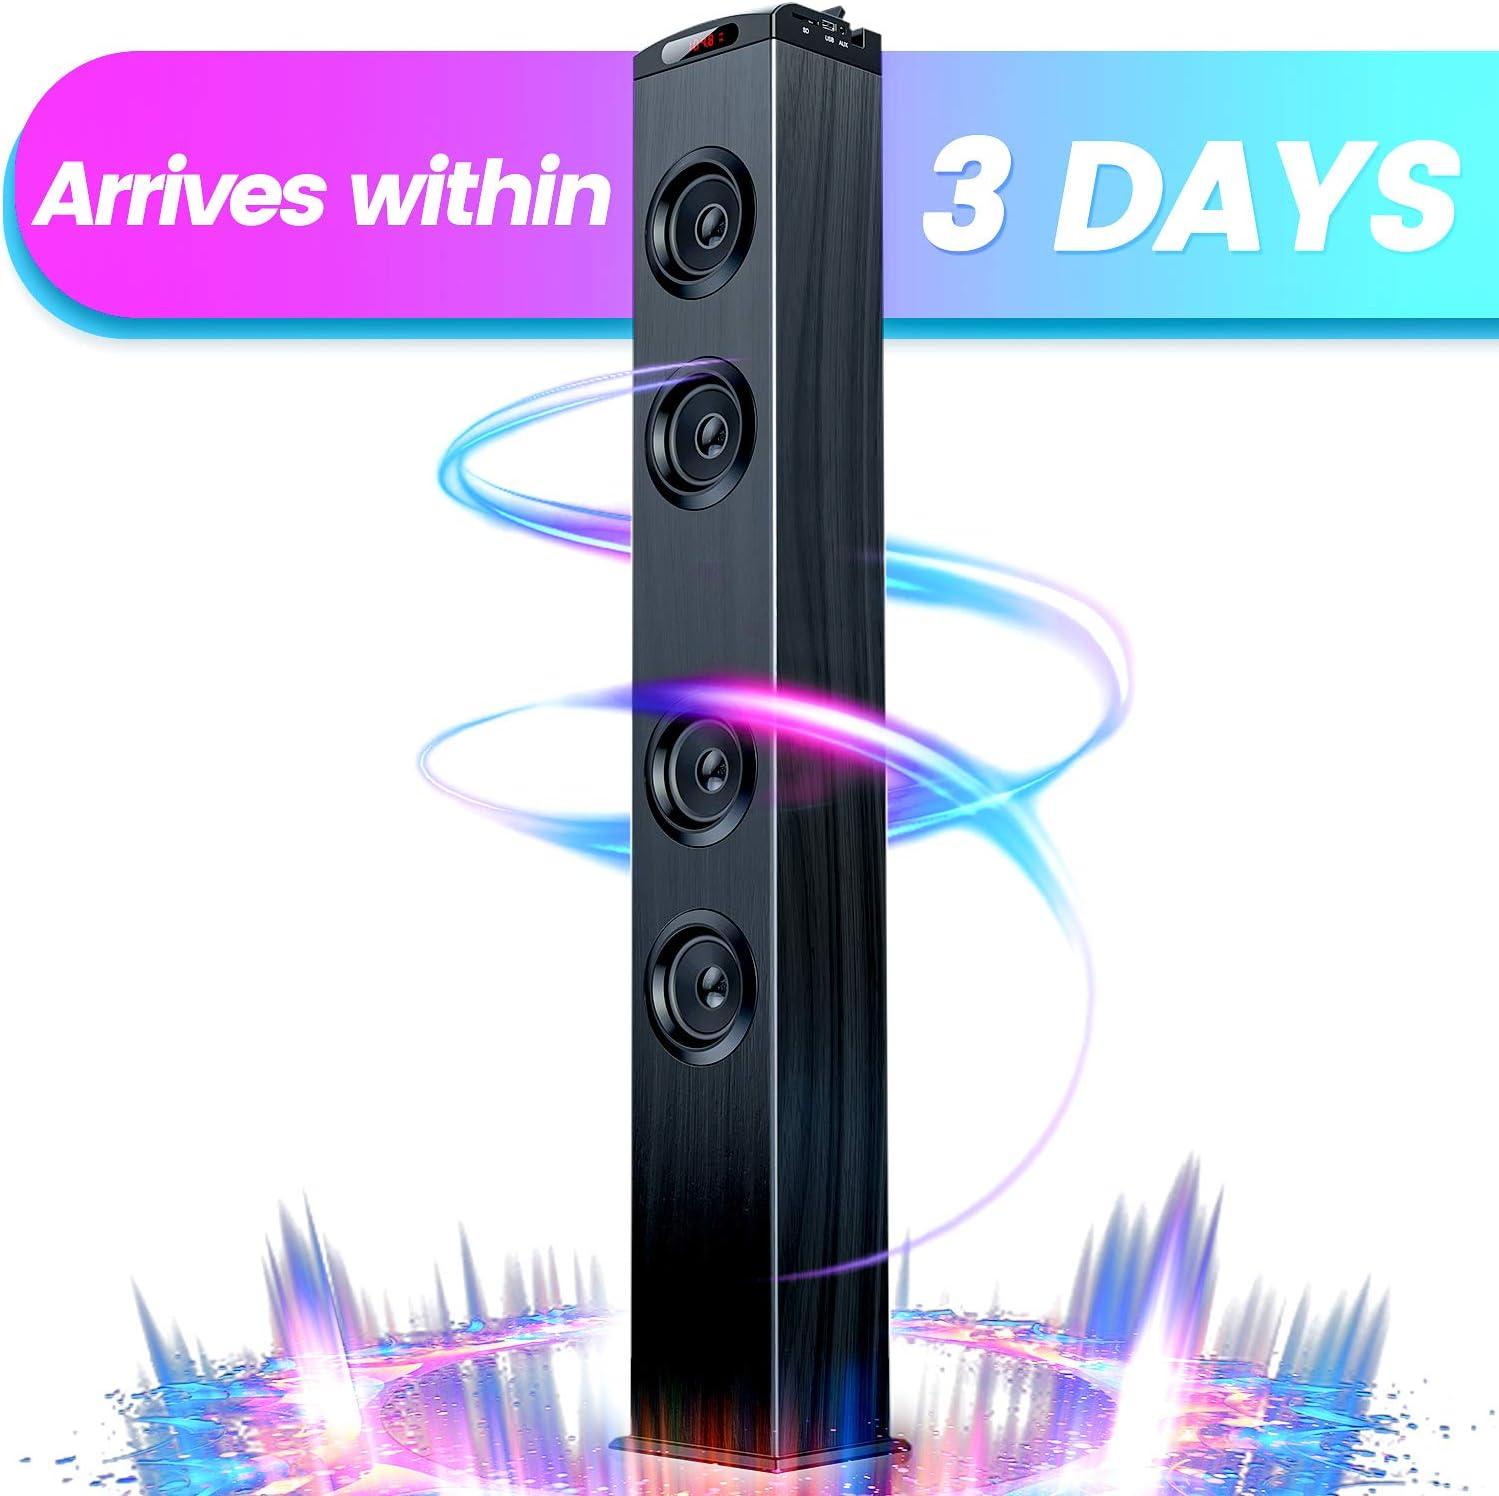 Floor Standing Bluetooth Tower Speaker, Floor Speakers for Home Stero System, Floor Standing Speakers Home Theater, VENLOIC Bluetooth Tower Speakers with Bass